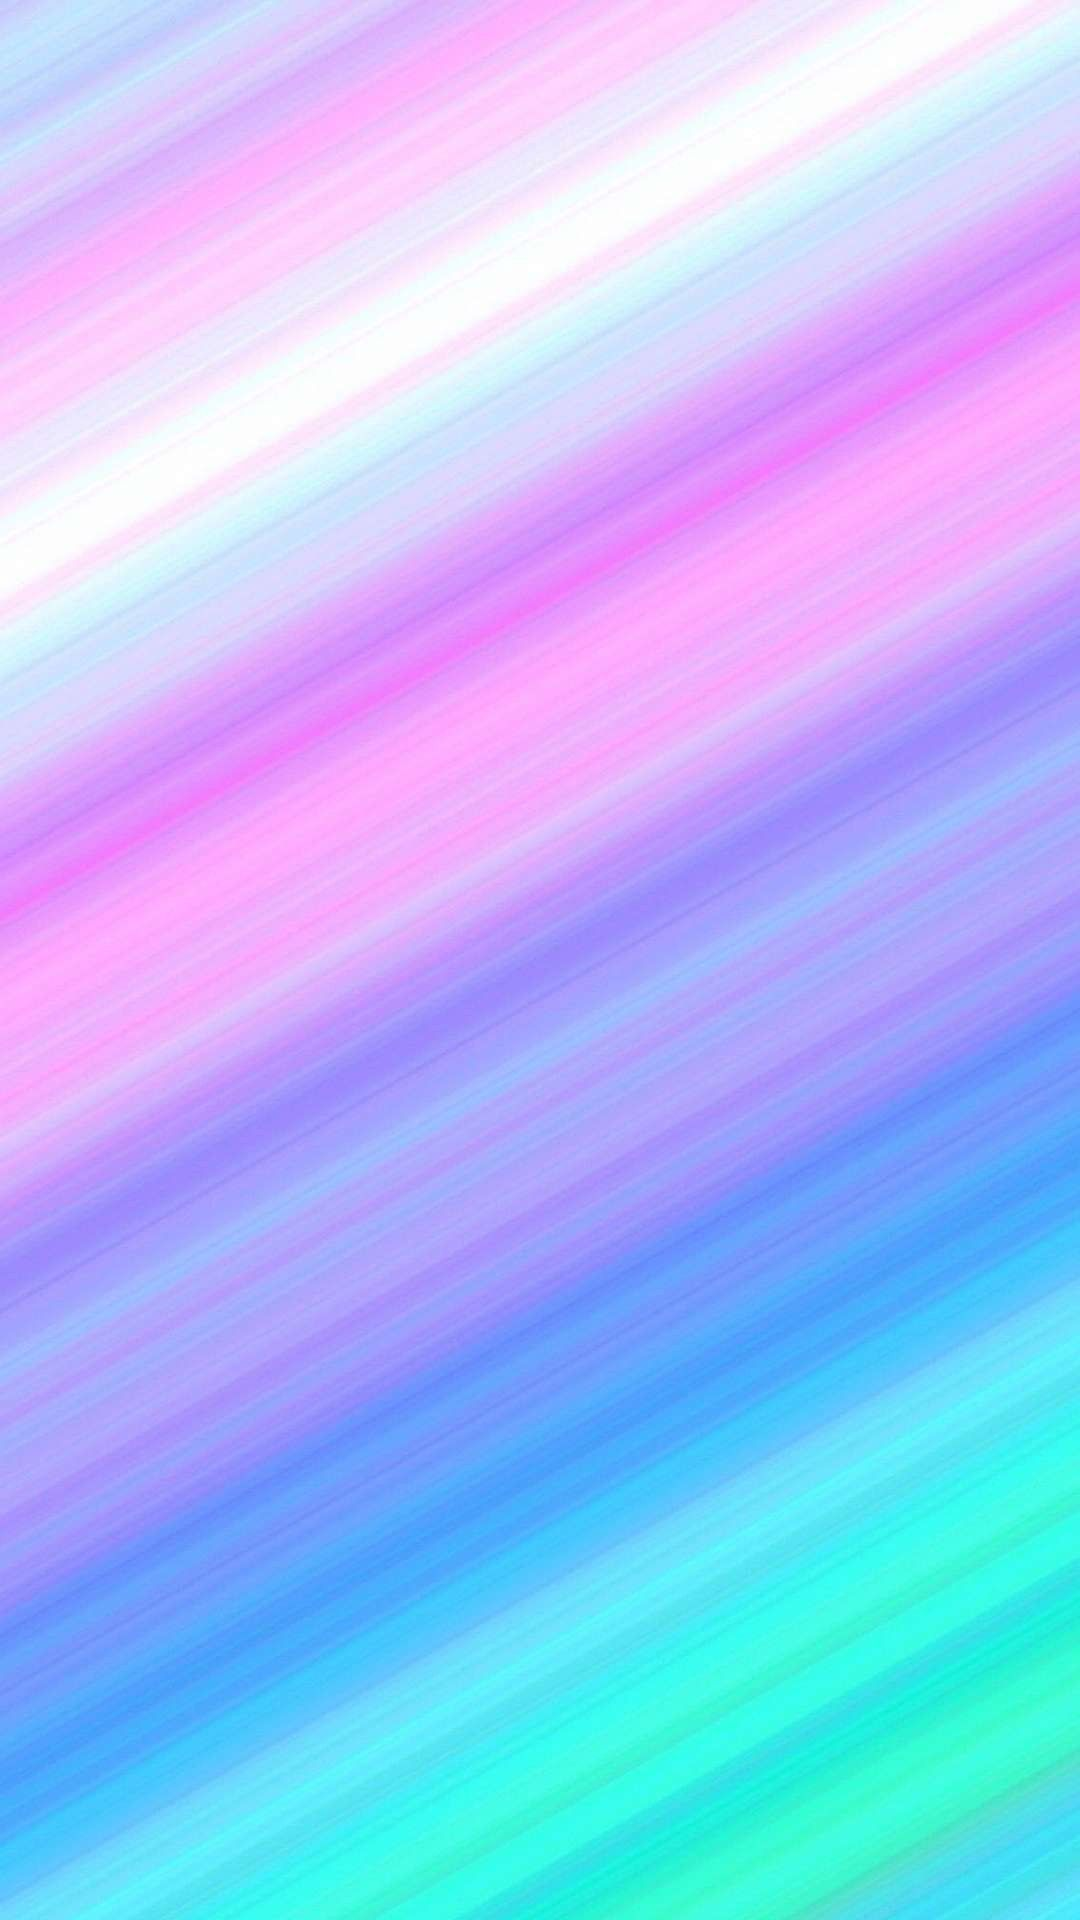 Rainbow Marble Galaxy Wallpaper Androidwallpaper Iphonewallpaper